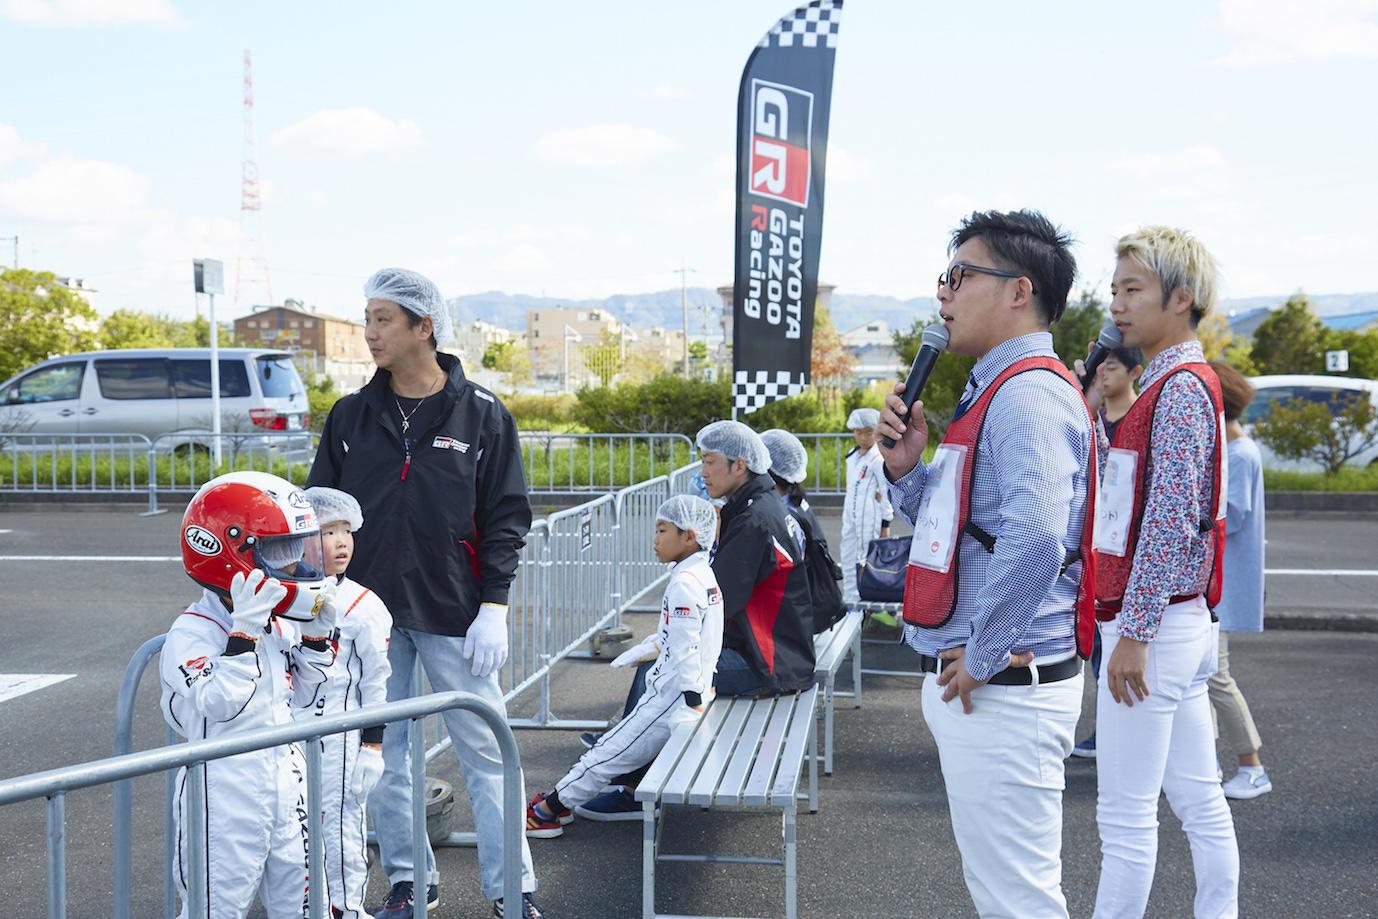 http://news.yoshimoto.co.jp/20181012090532-d84b07131e52bb8a15919a7b105f8ae6a55b10c0.jpg